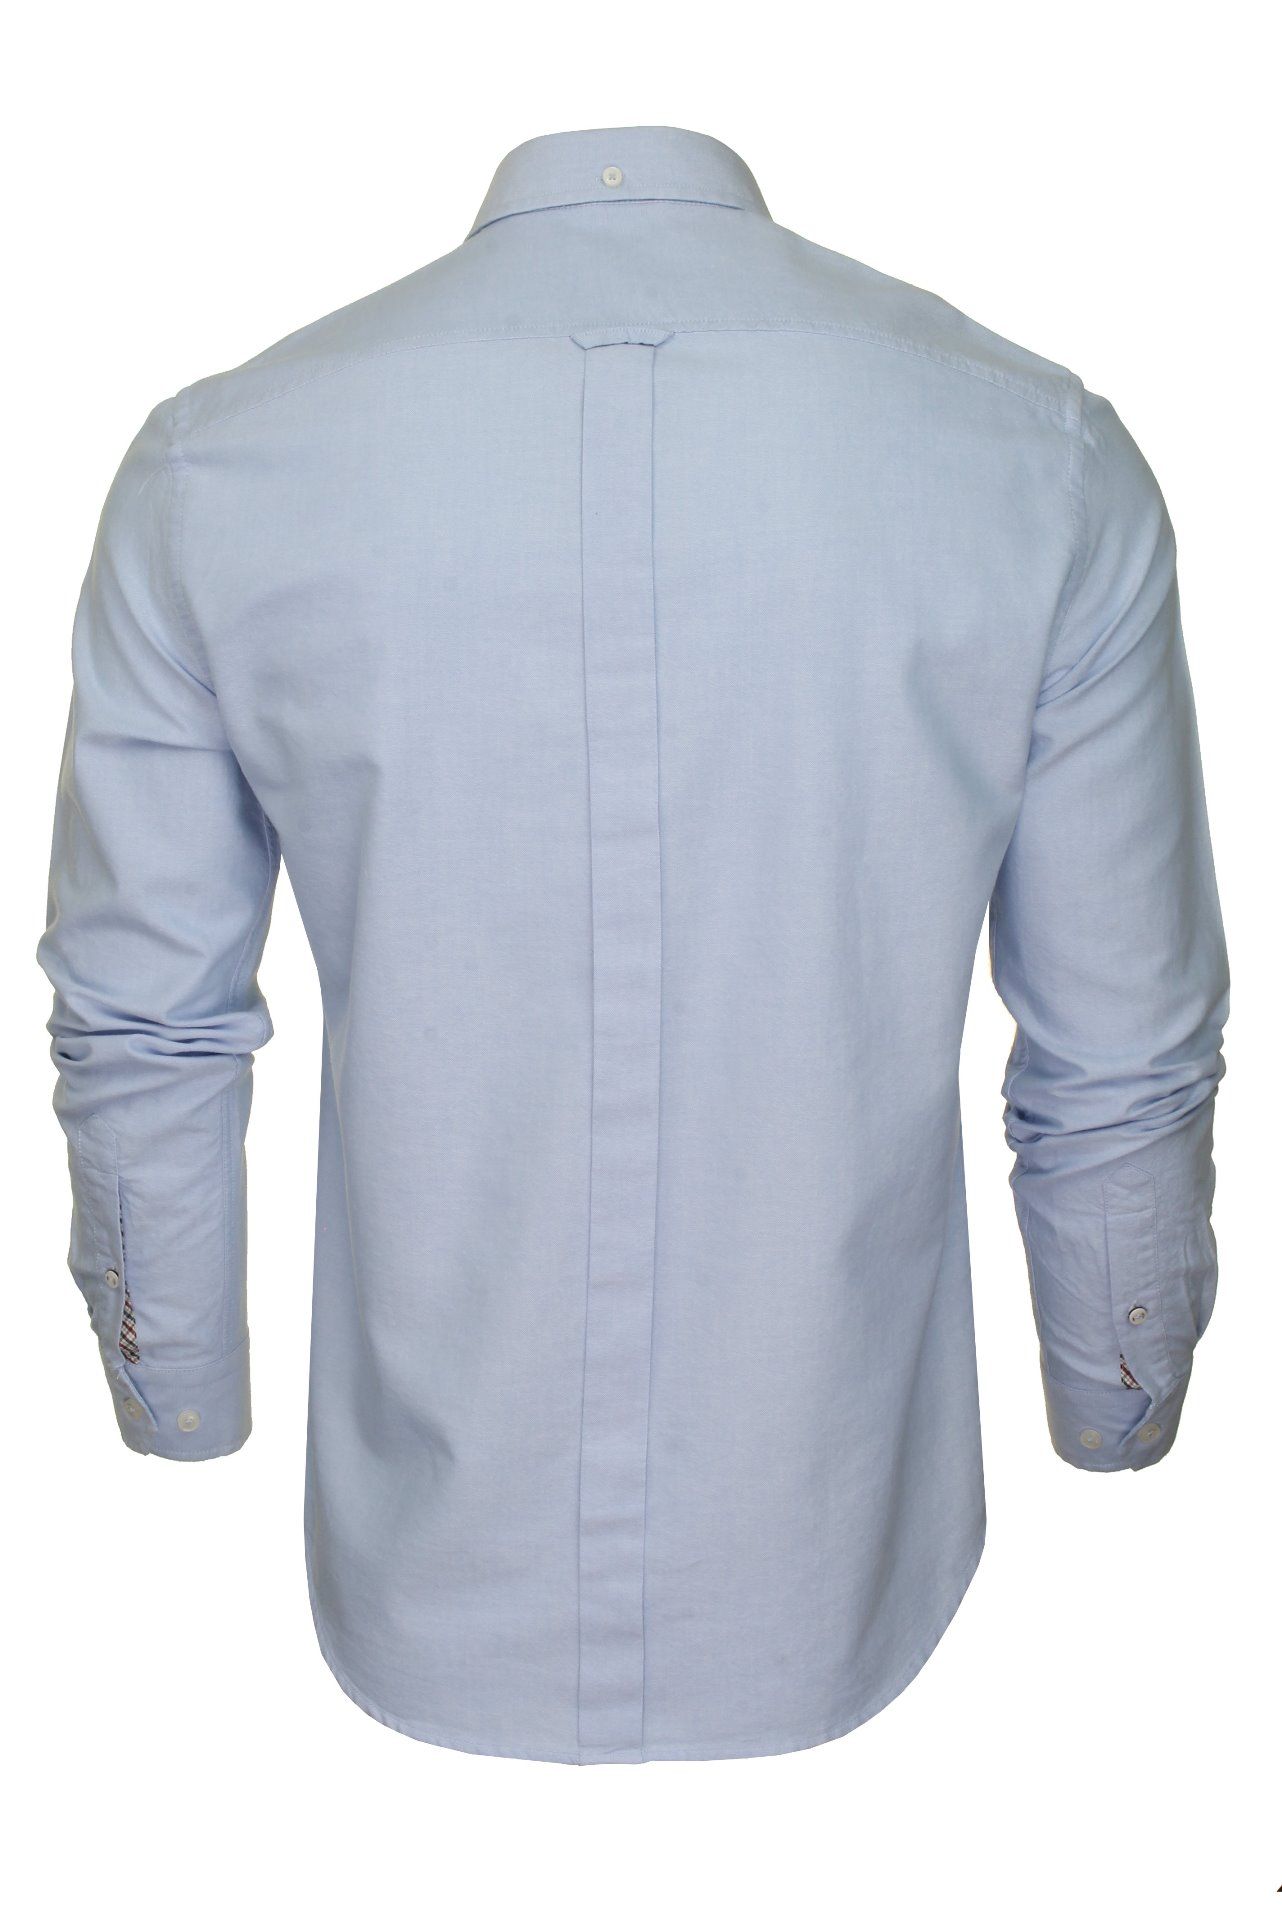 Mens-Oxford-Shirt-by-Ben-Sherman-Long-Sleeved thumbnail 34